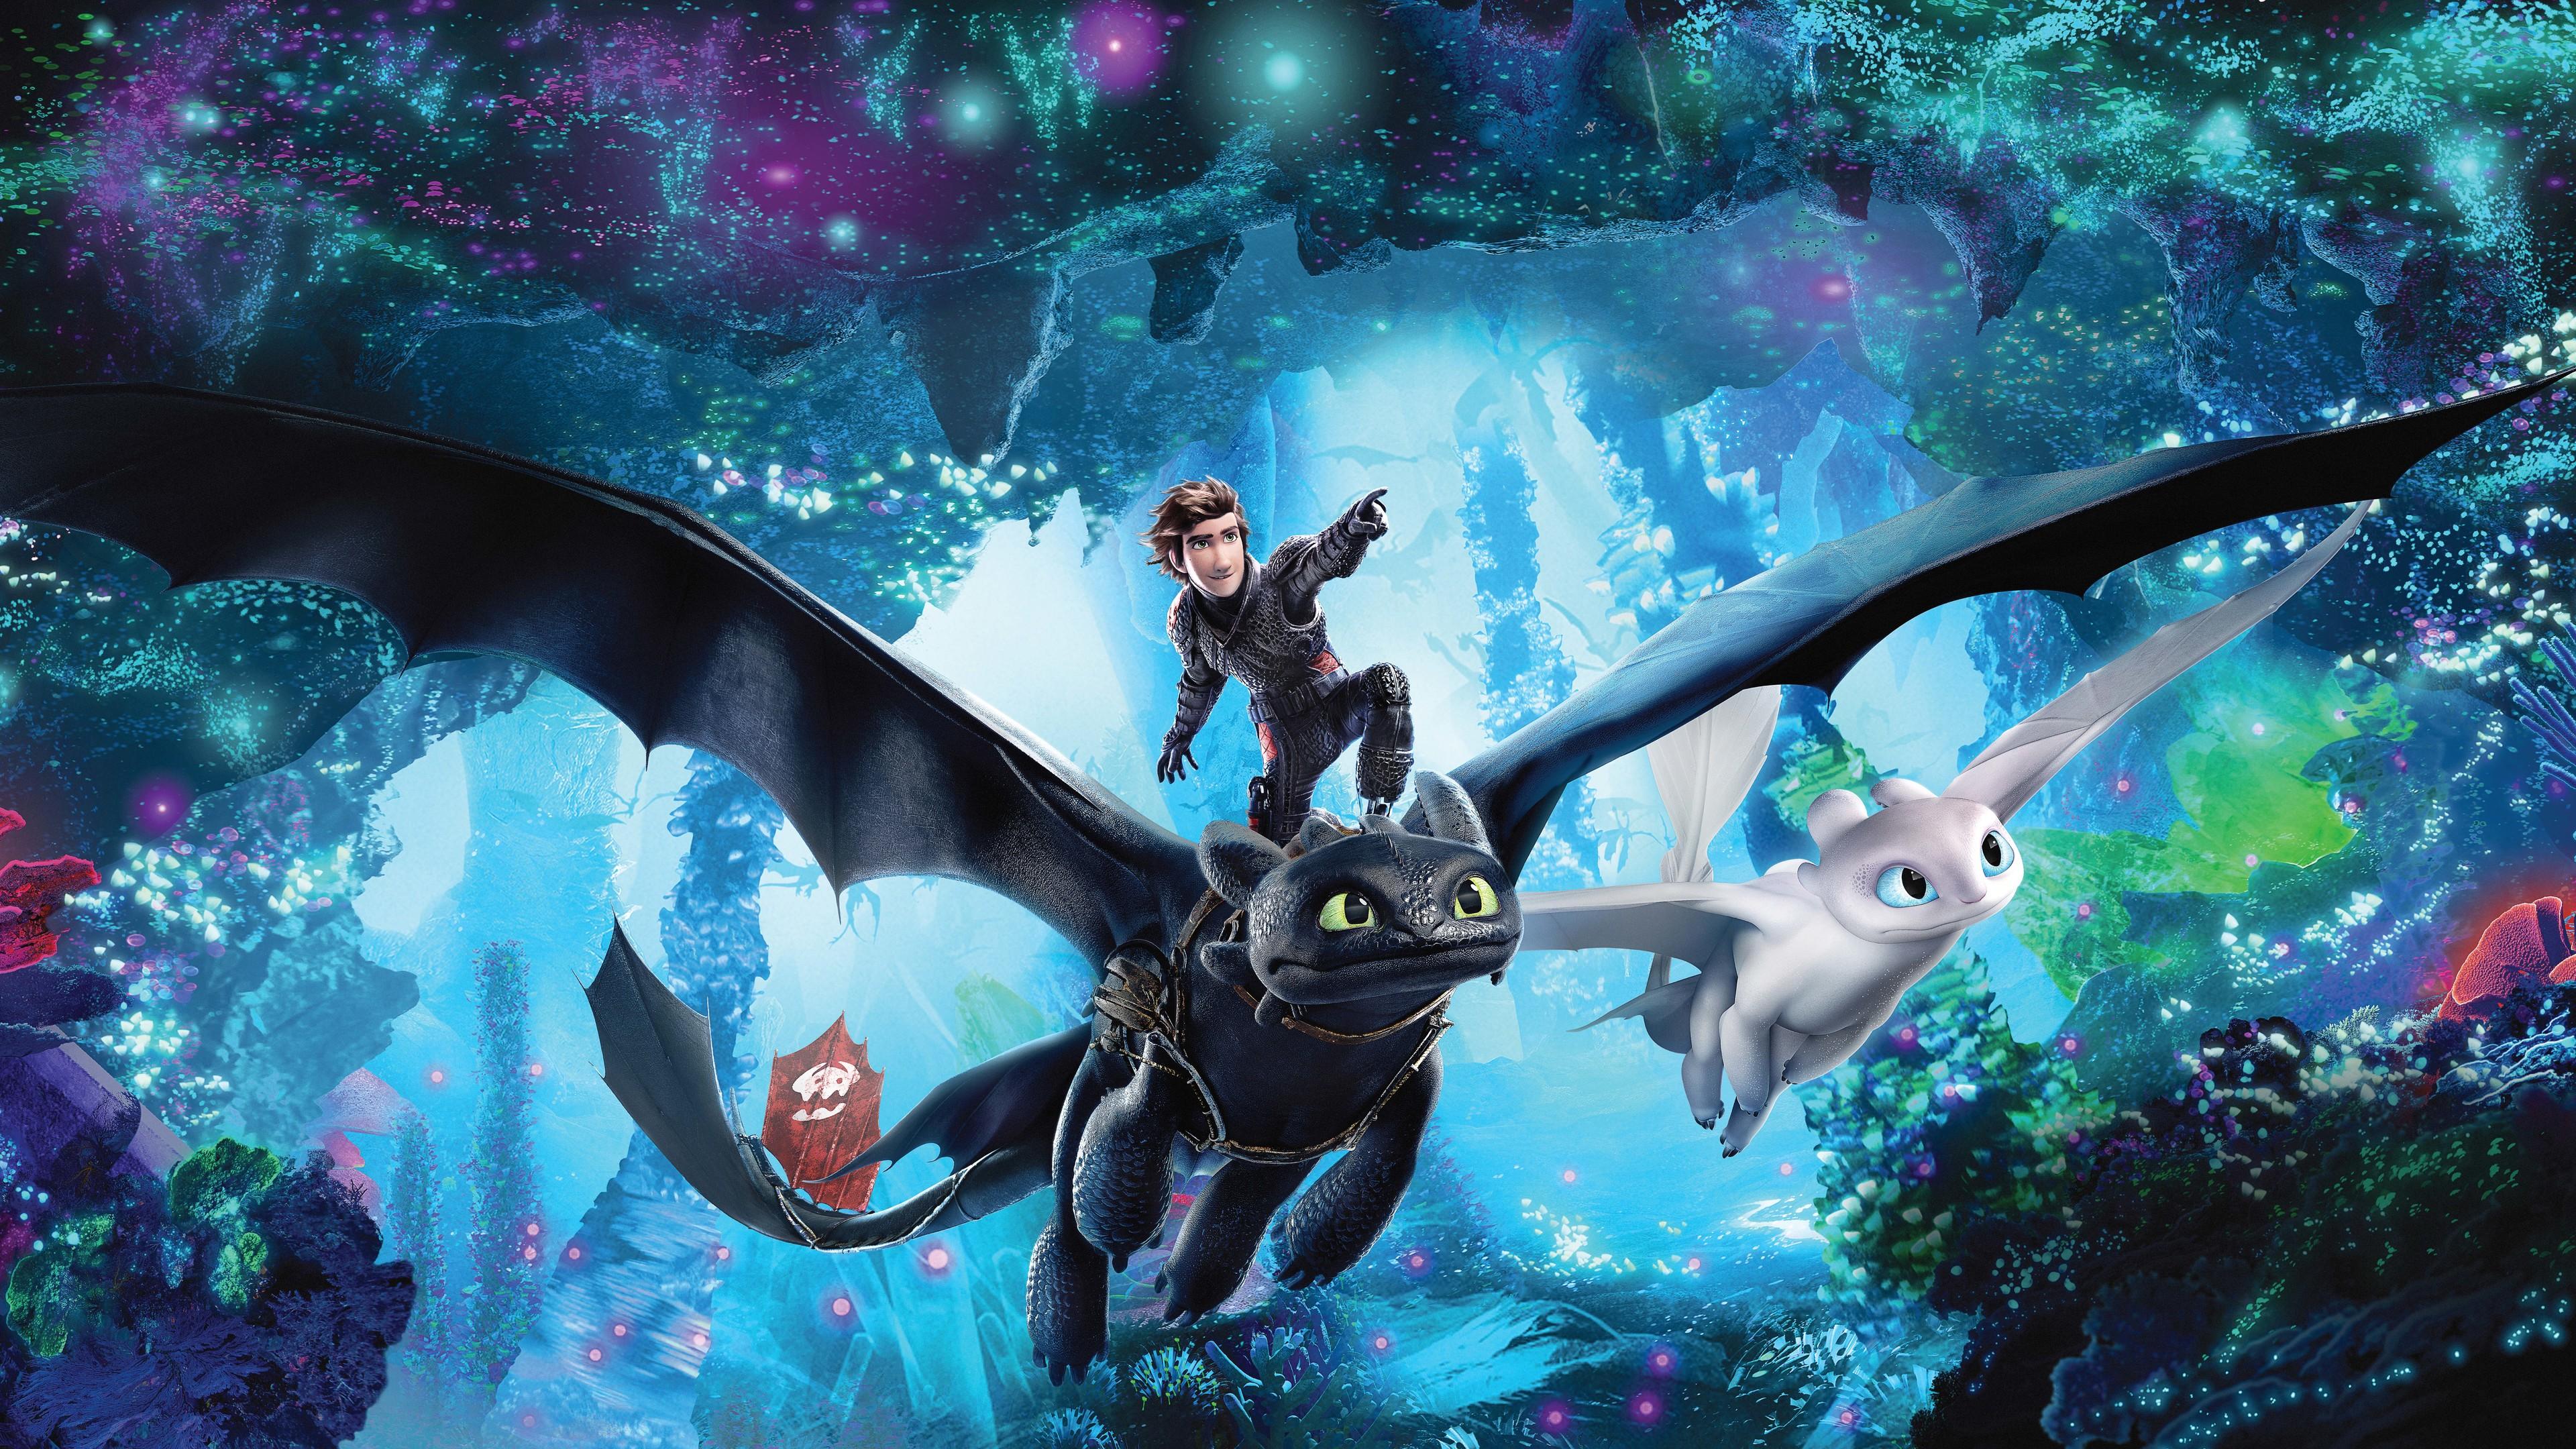 Train Your Dragon The Hidden World 1280x720 Download Hd Wallpaper Wallpapertip